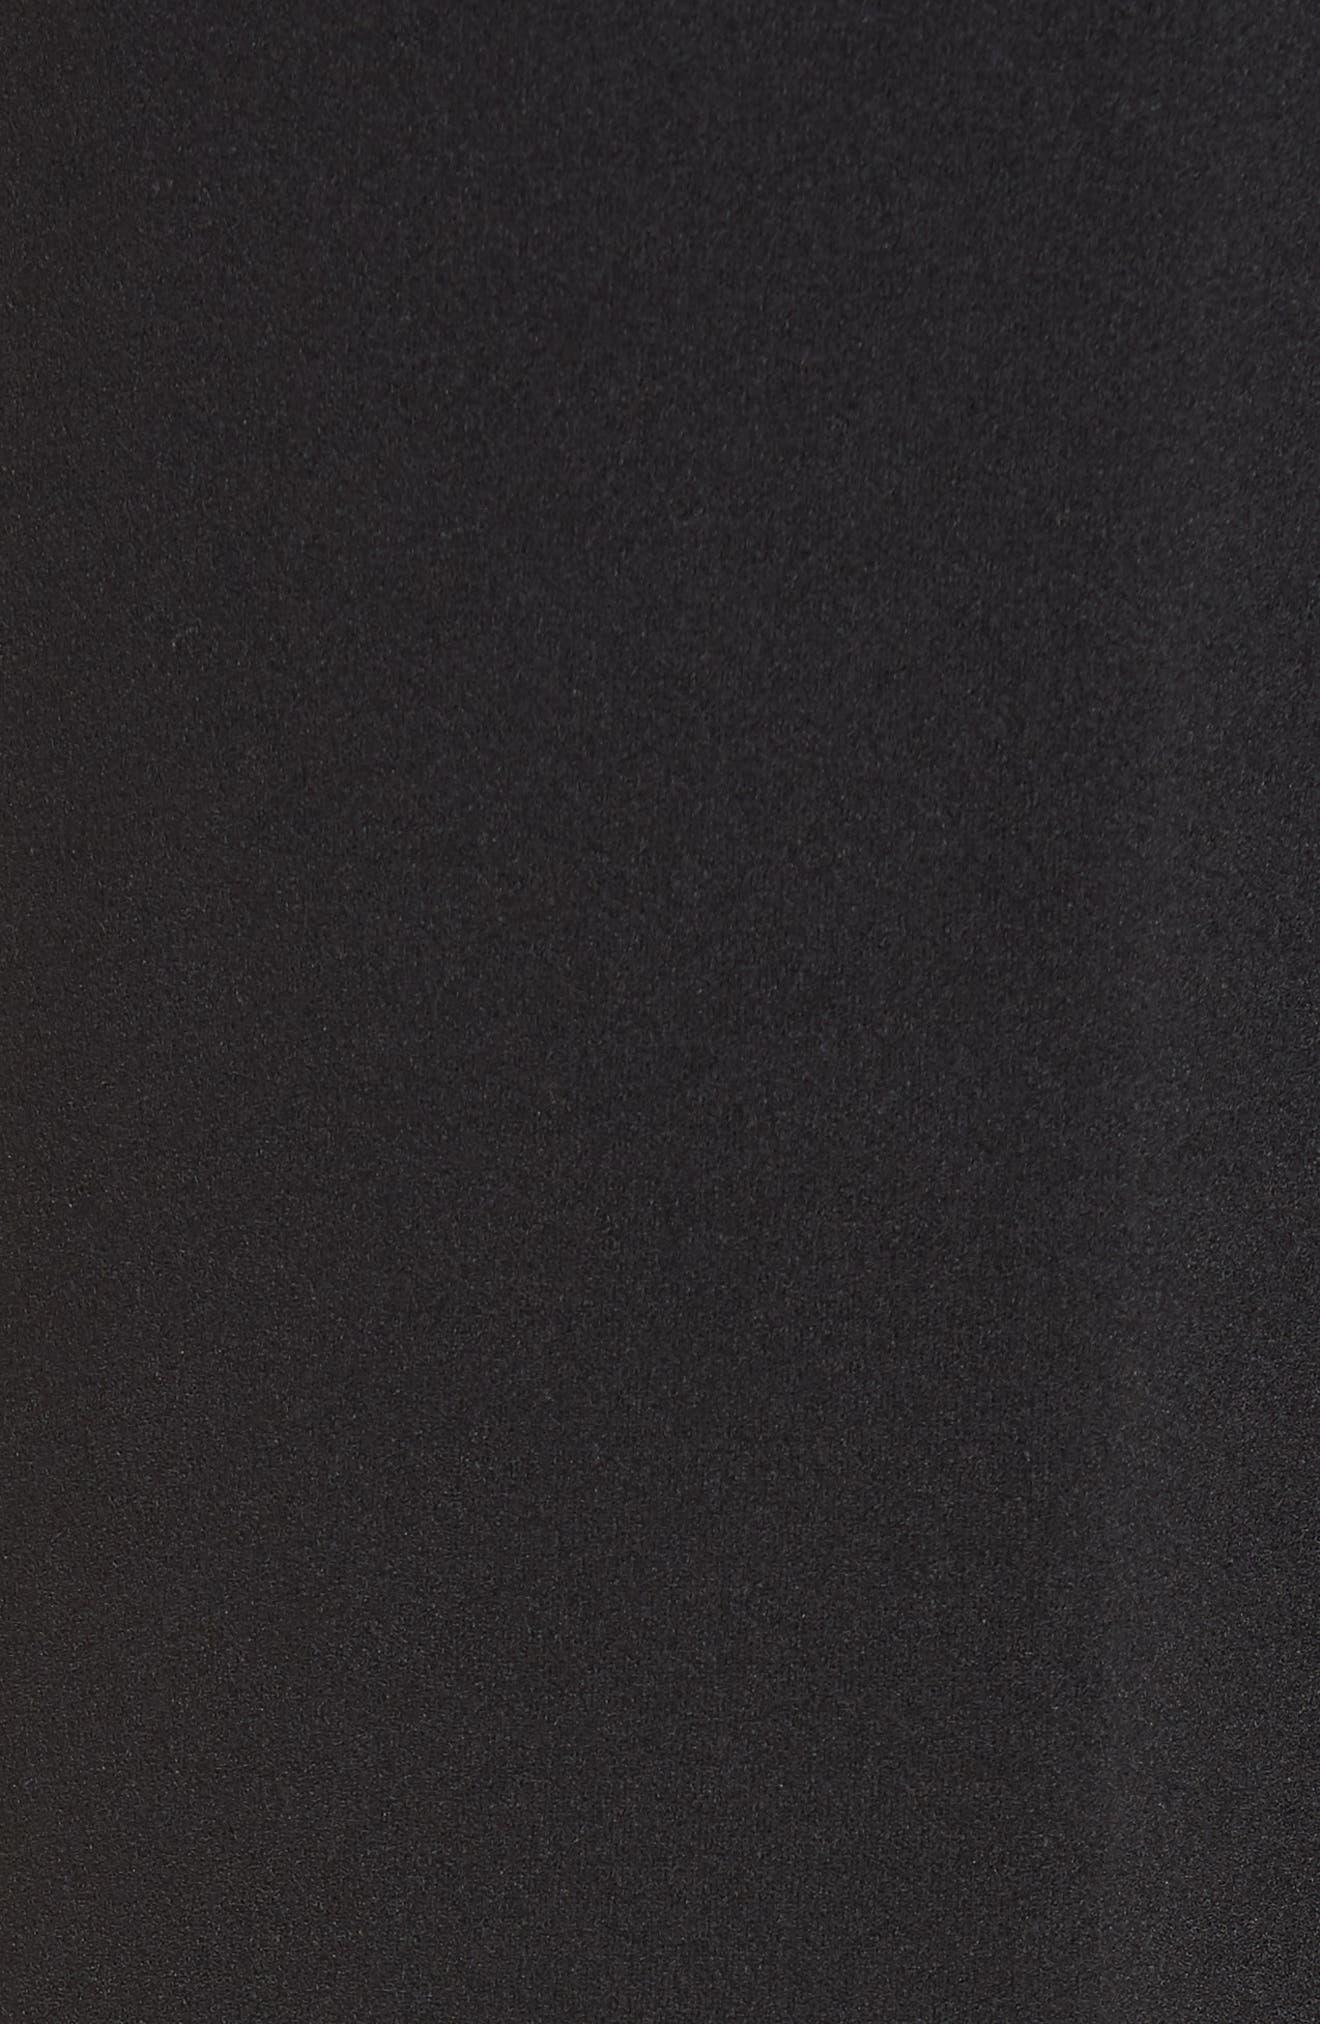 High Waist Belted Pants,                             Alternate thumbnail 6, color,                             BLACK